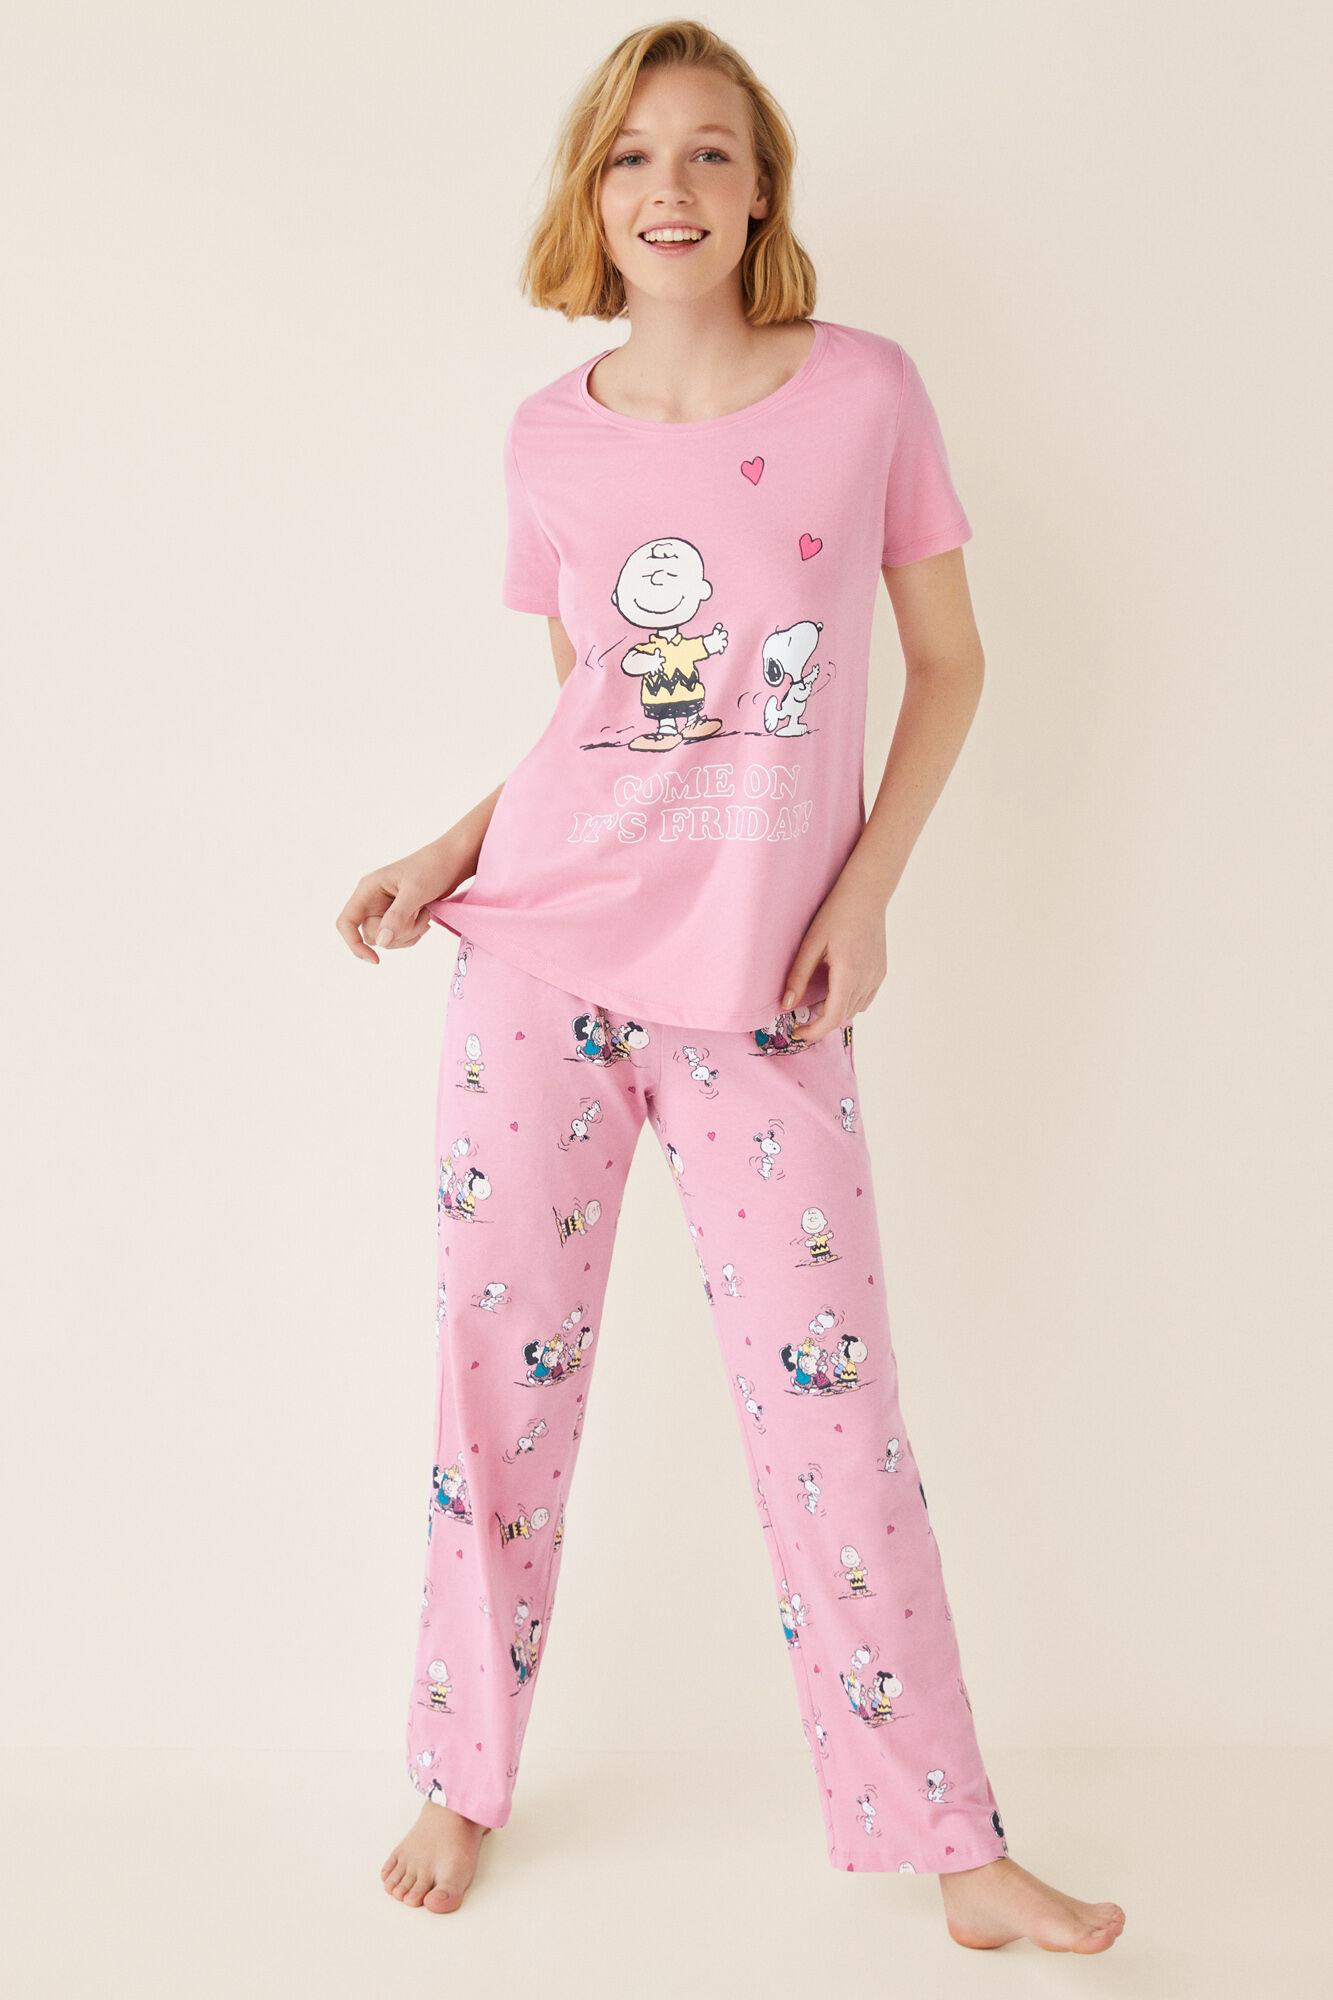 3eea6e022 Pijama manga corta Snoopy Friday